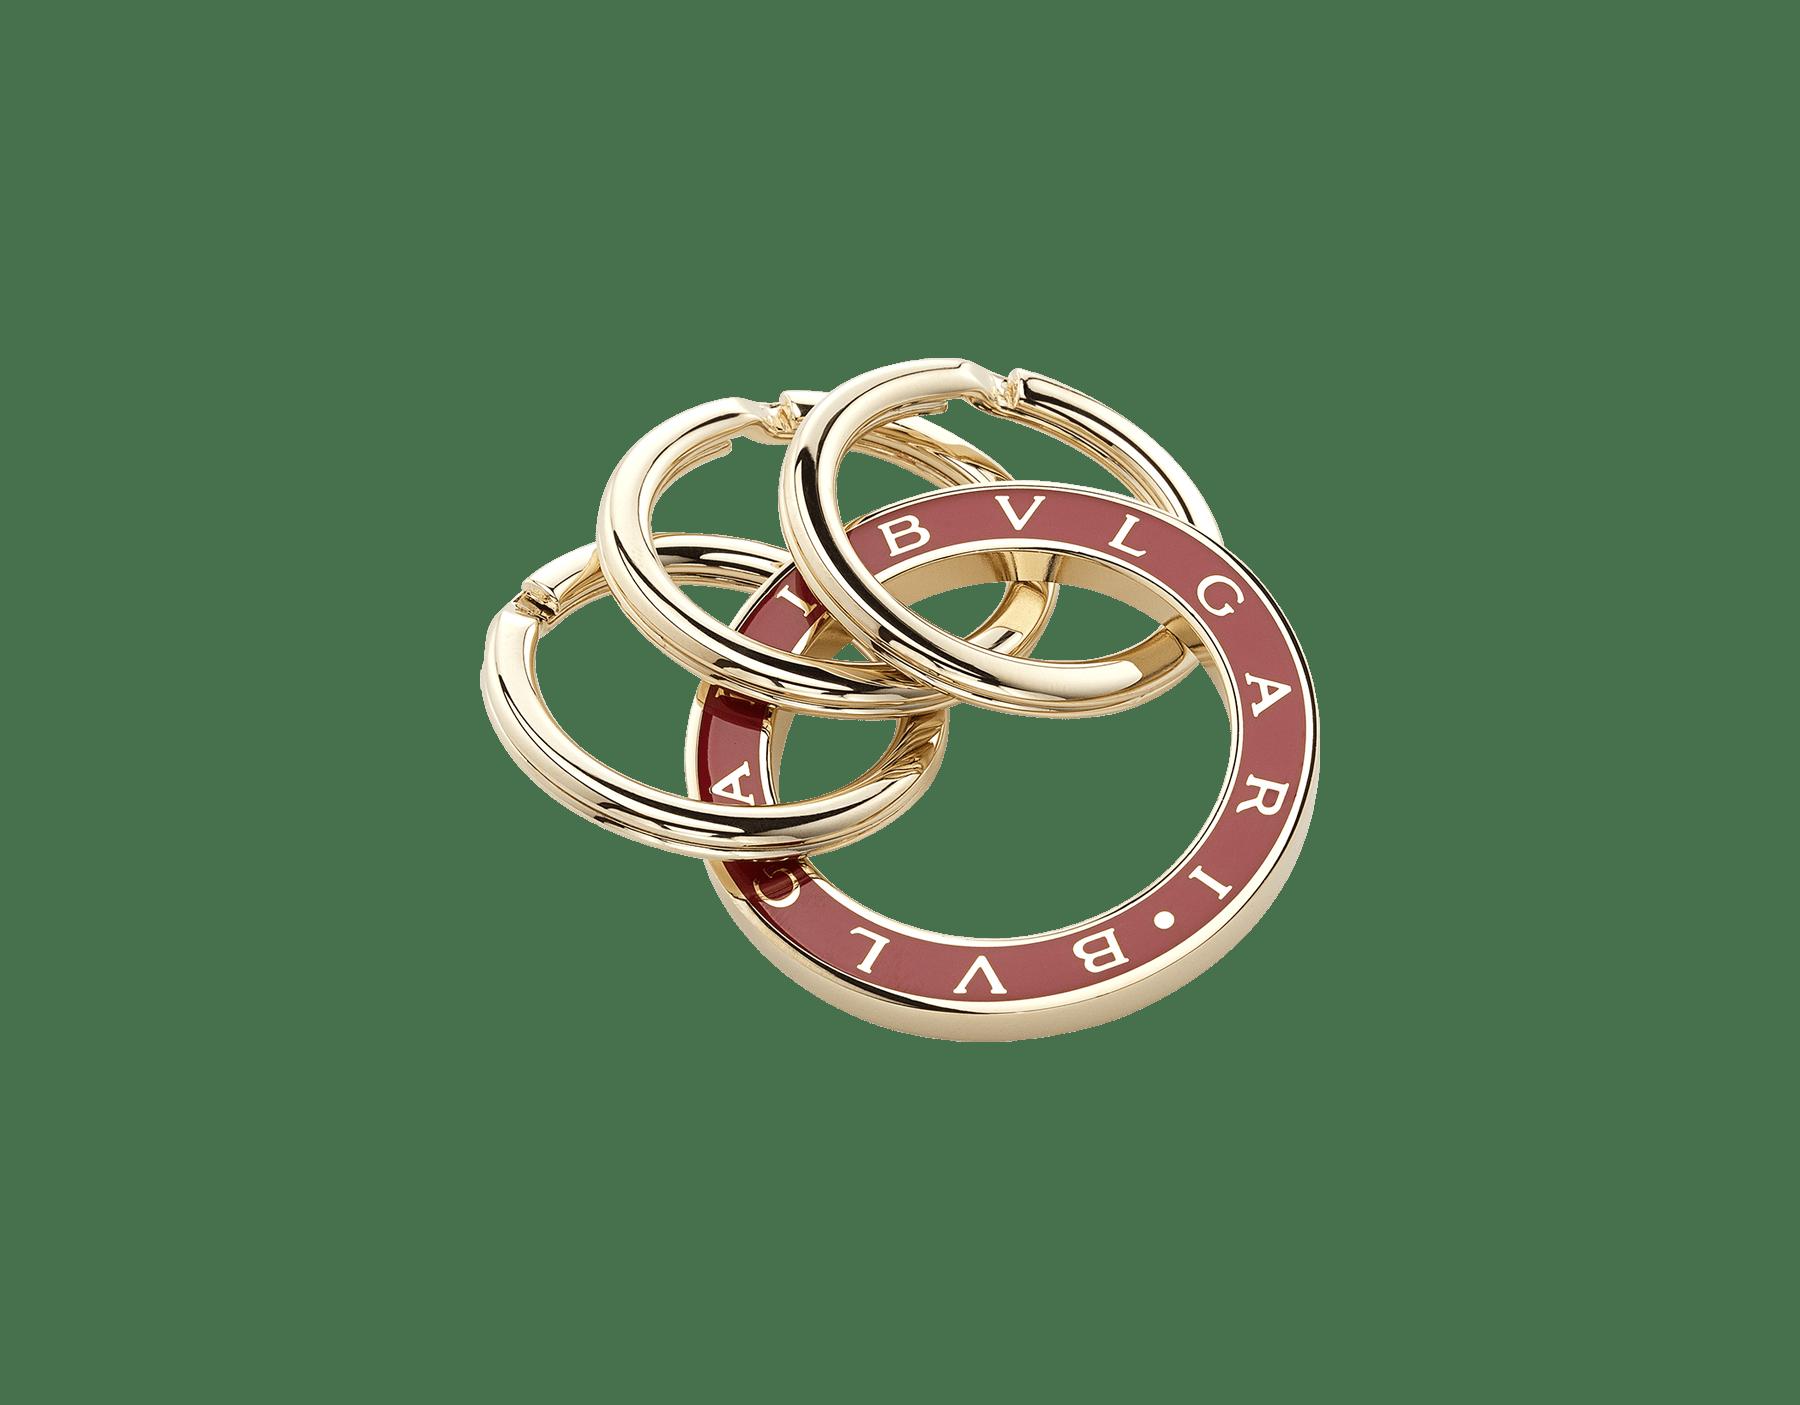 Keyrings white enamel and light gold KEYRING-BB-ENAMEL image 1